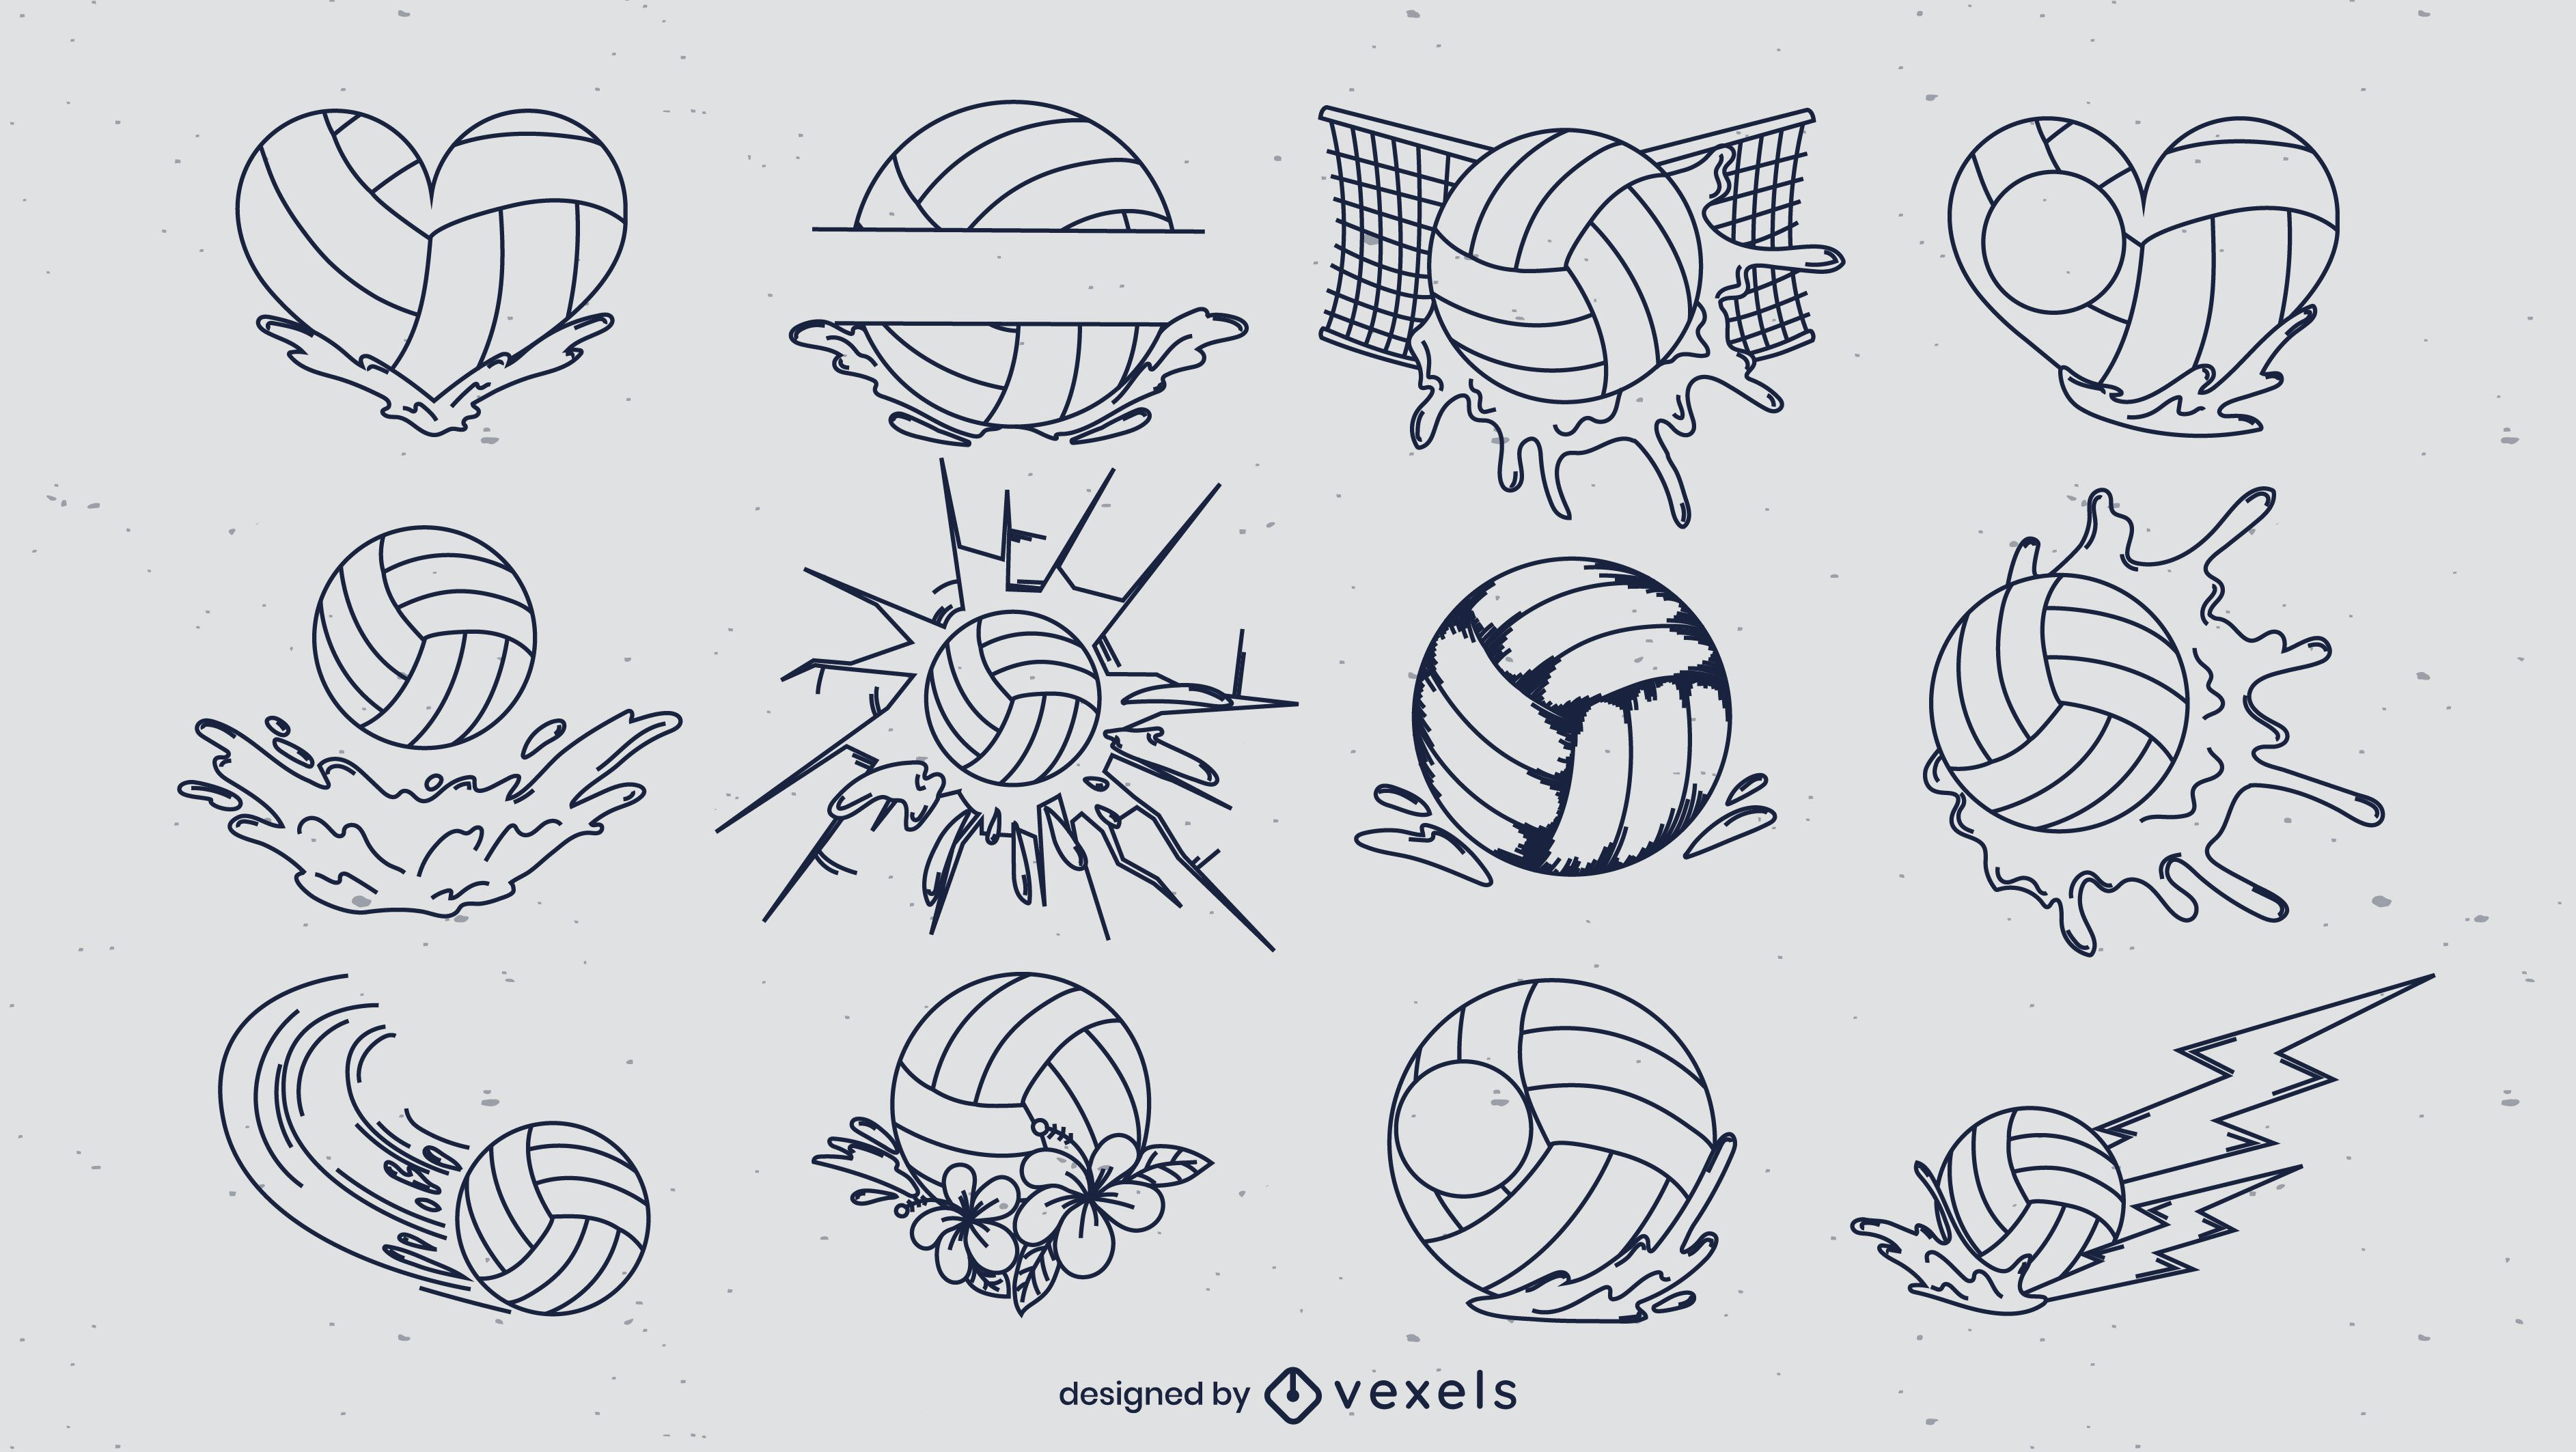 Water polo ball line art elements set